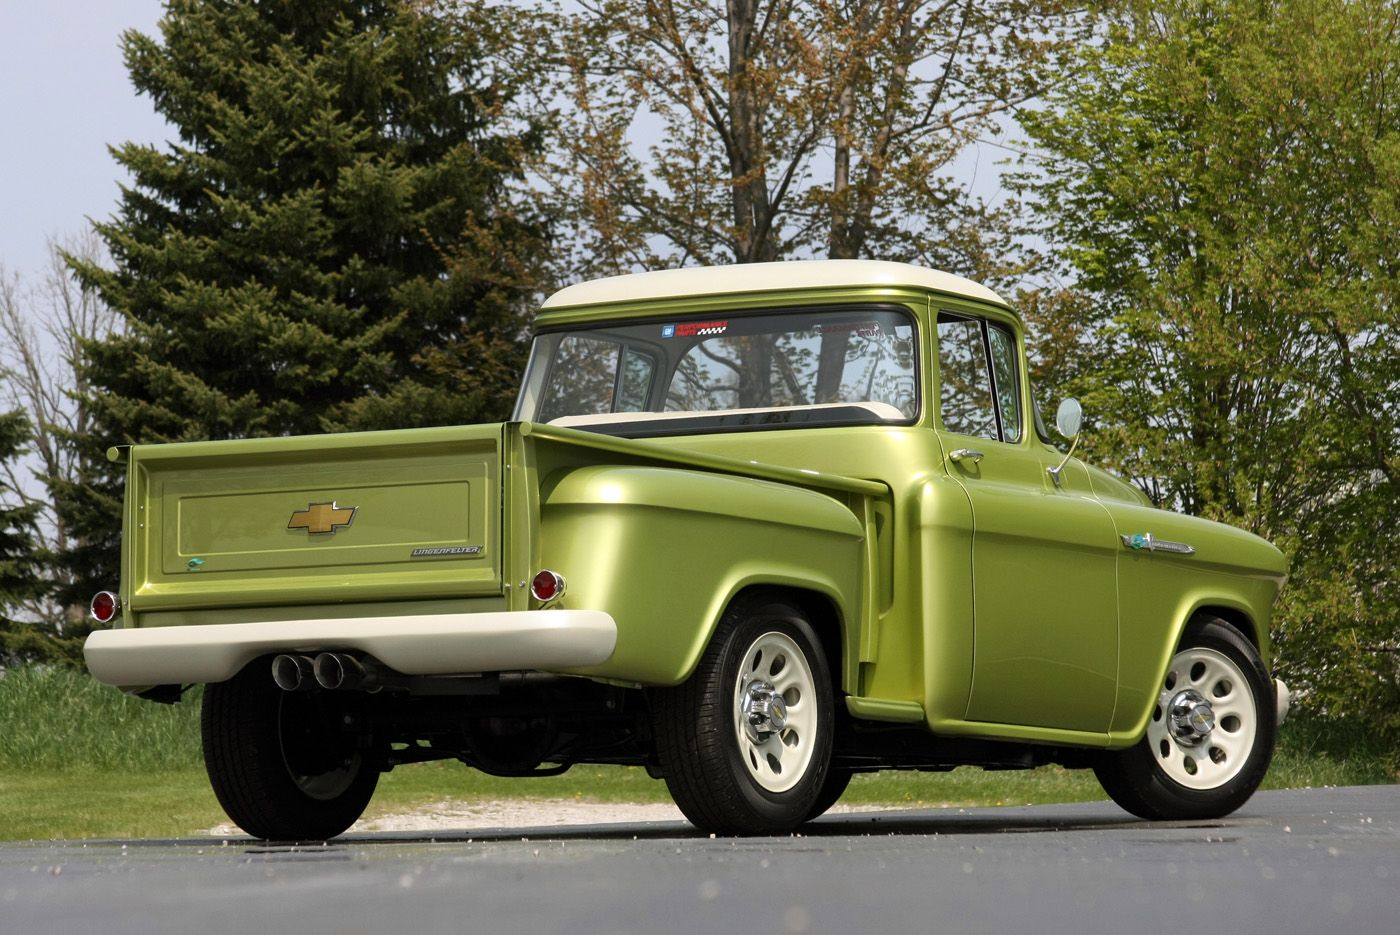 1955 Chevrolet E Rod Pickup Computer Wallpapers Desktop Backgrounds 1400x935 Id 289001 1955 Chevrolet Trucks Chevrolet